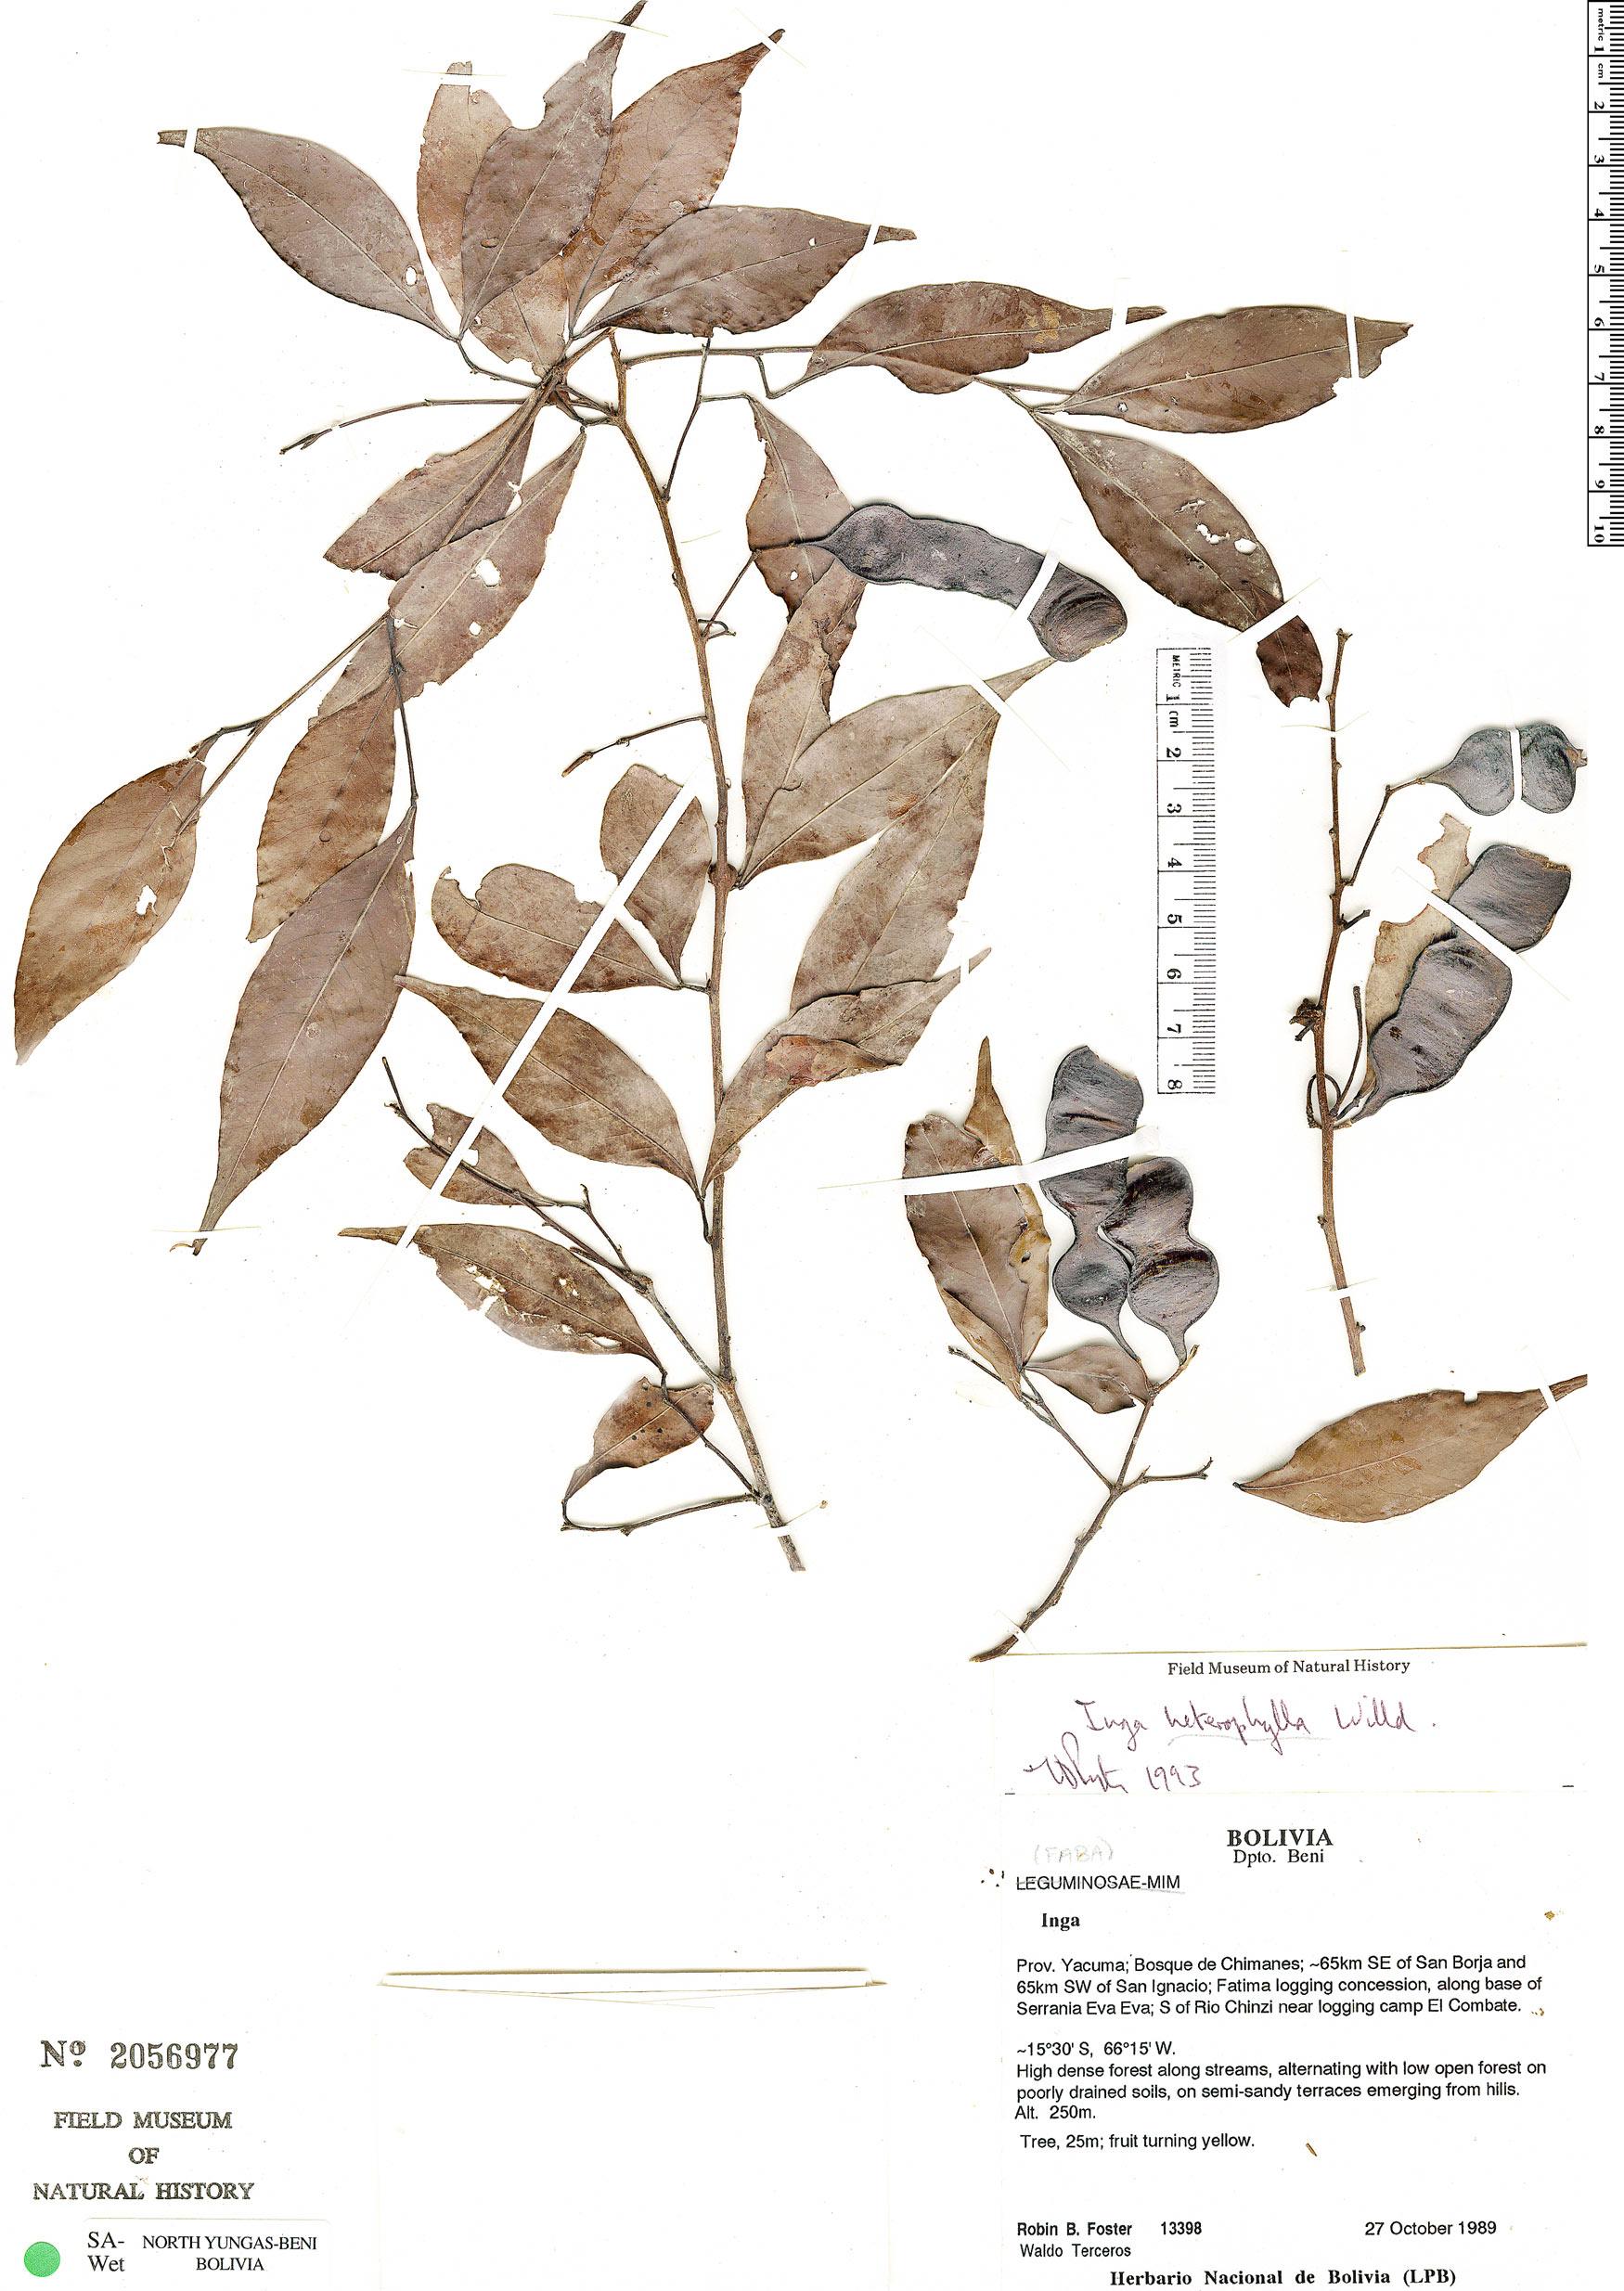 Specimen: Inga heterophylla